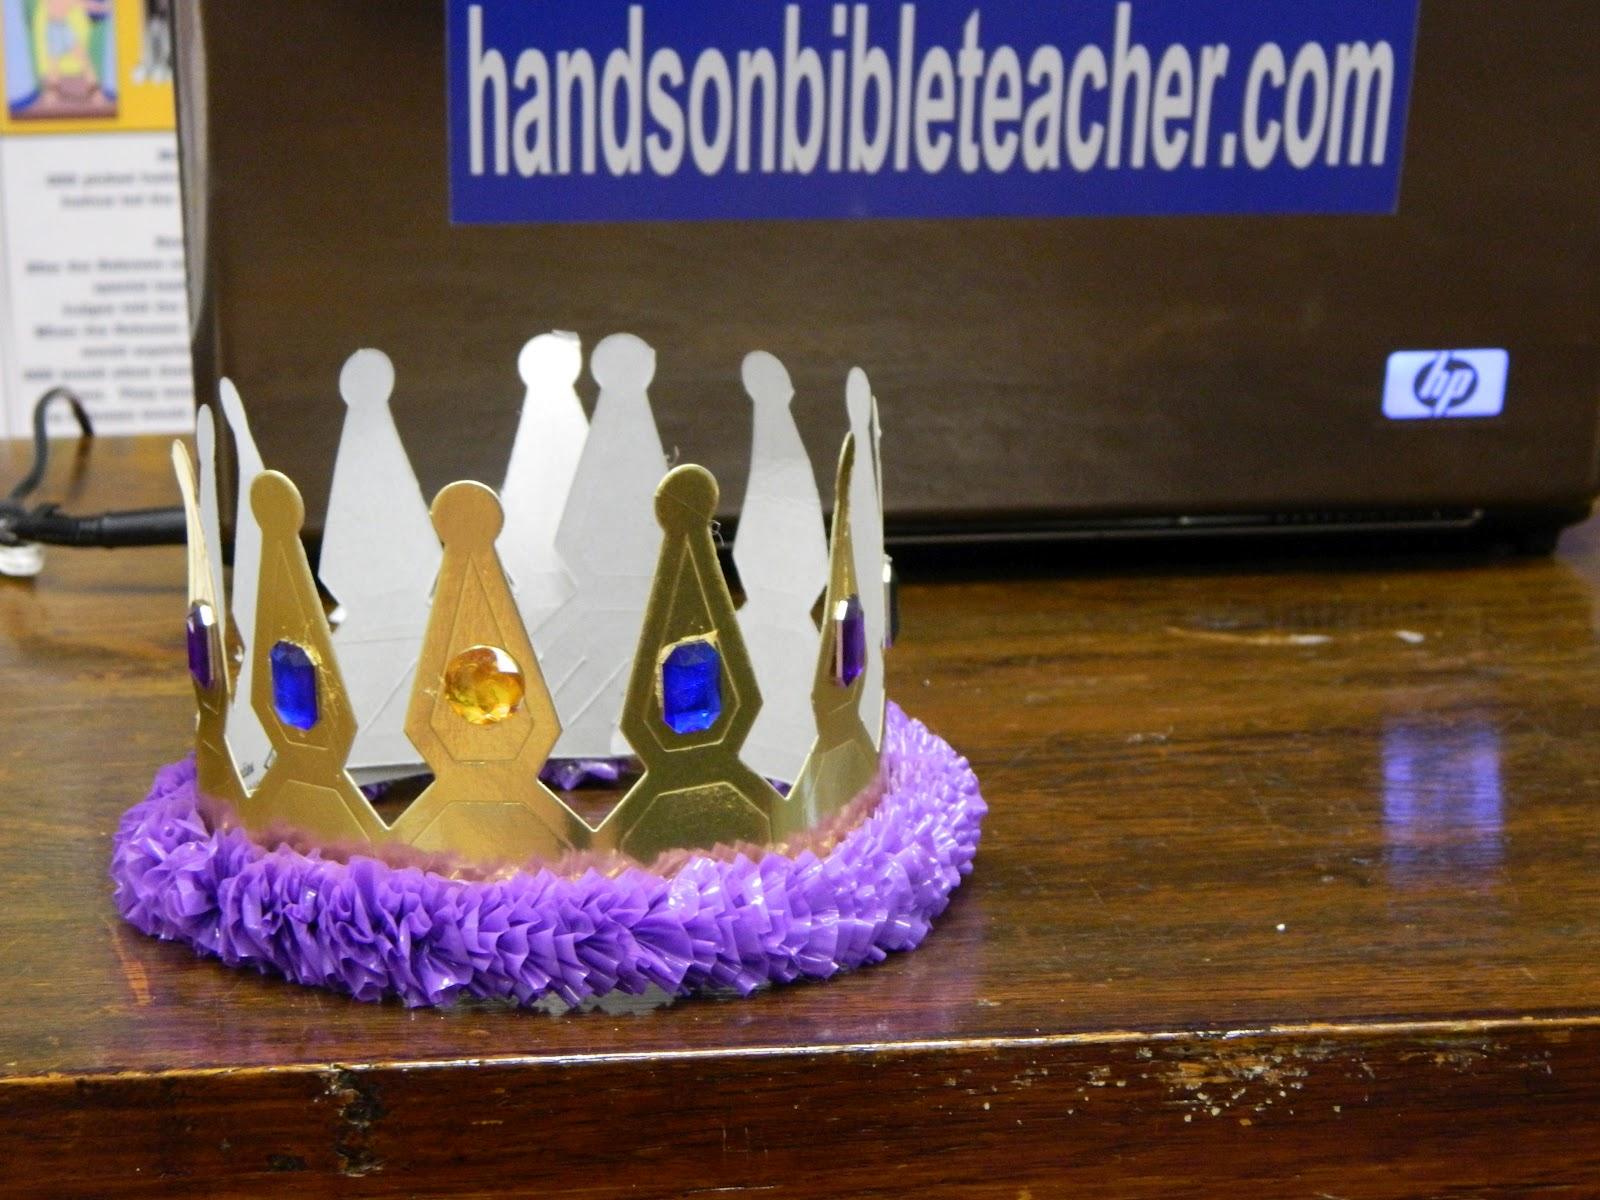 Hands On Bible Teacher David Crowned King